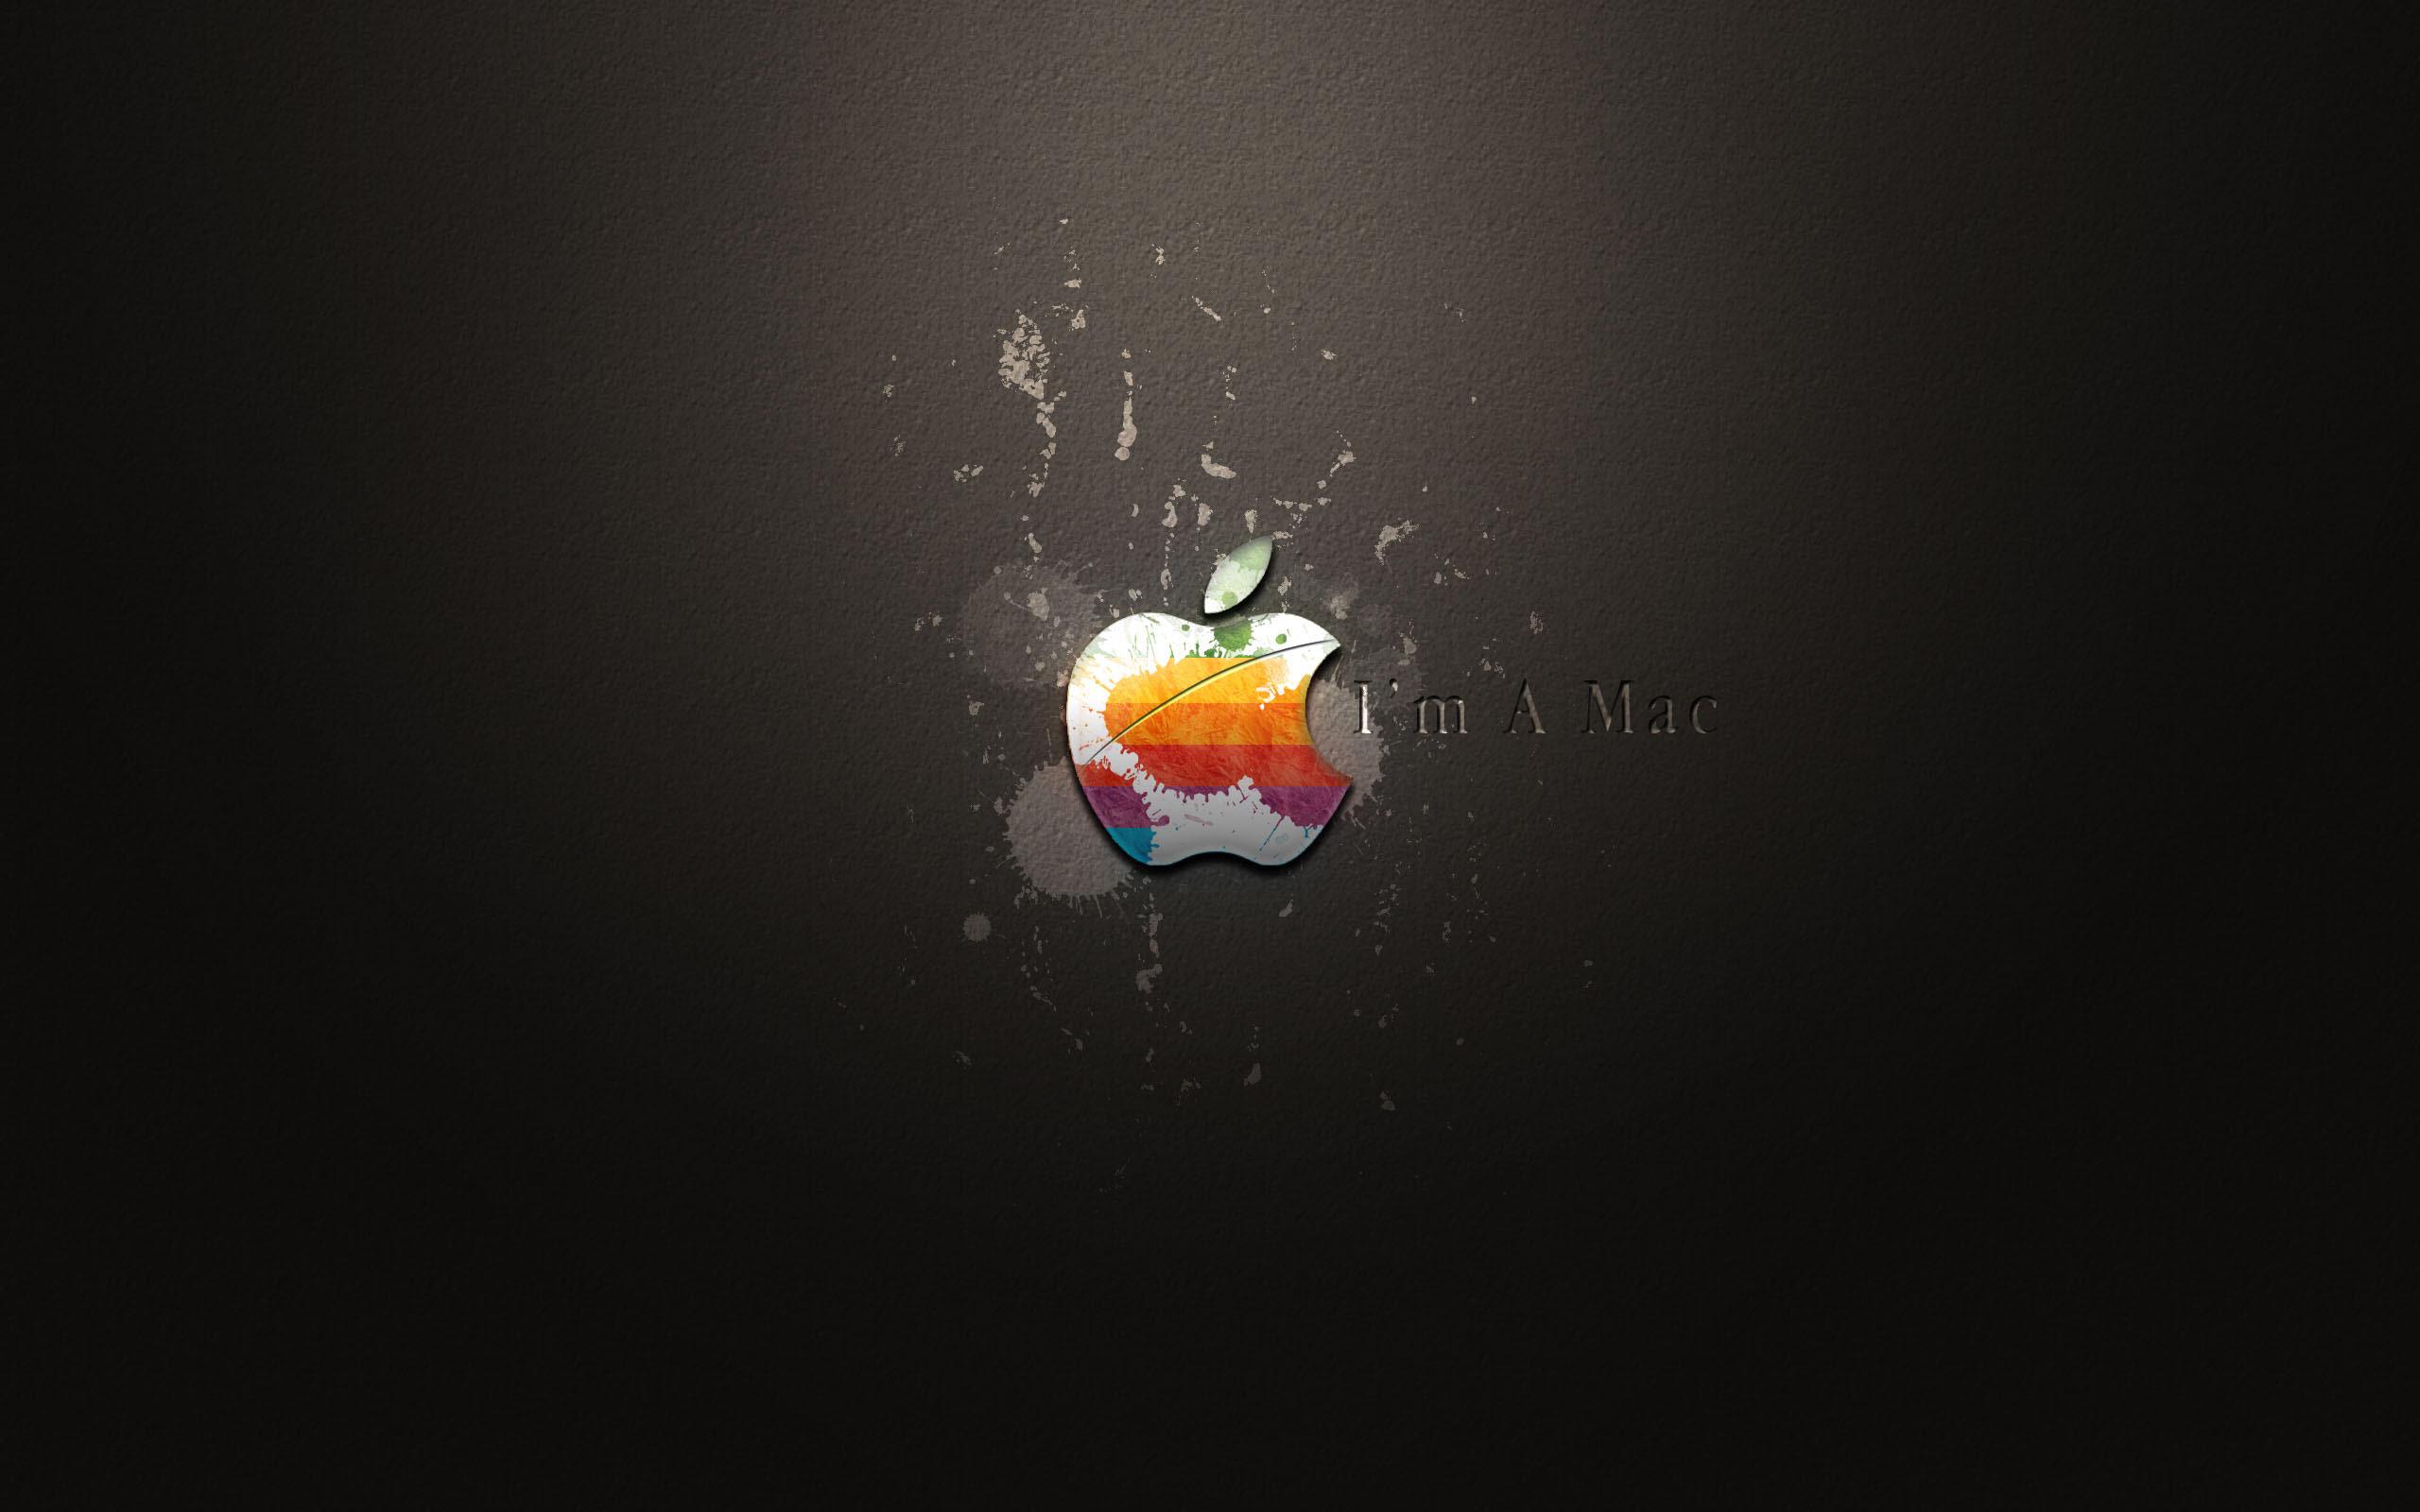 Mac Wallpapers Best Wallpapers 2560x1600